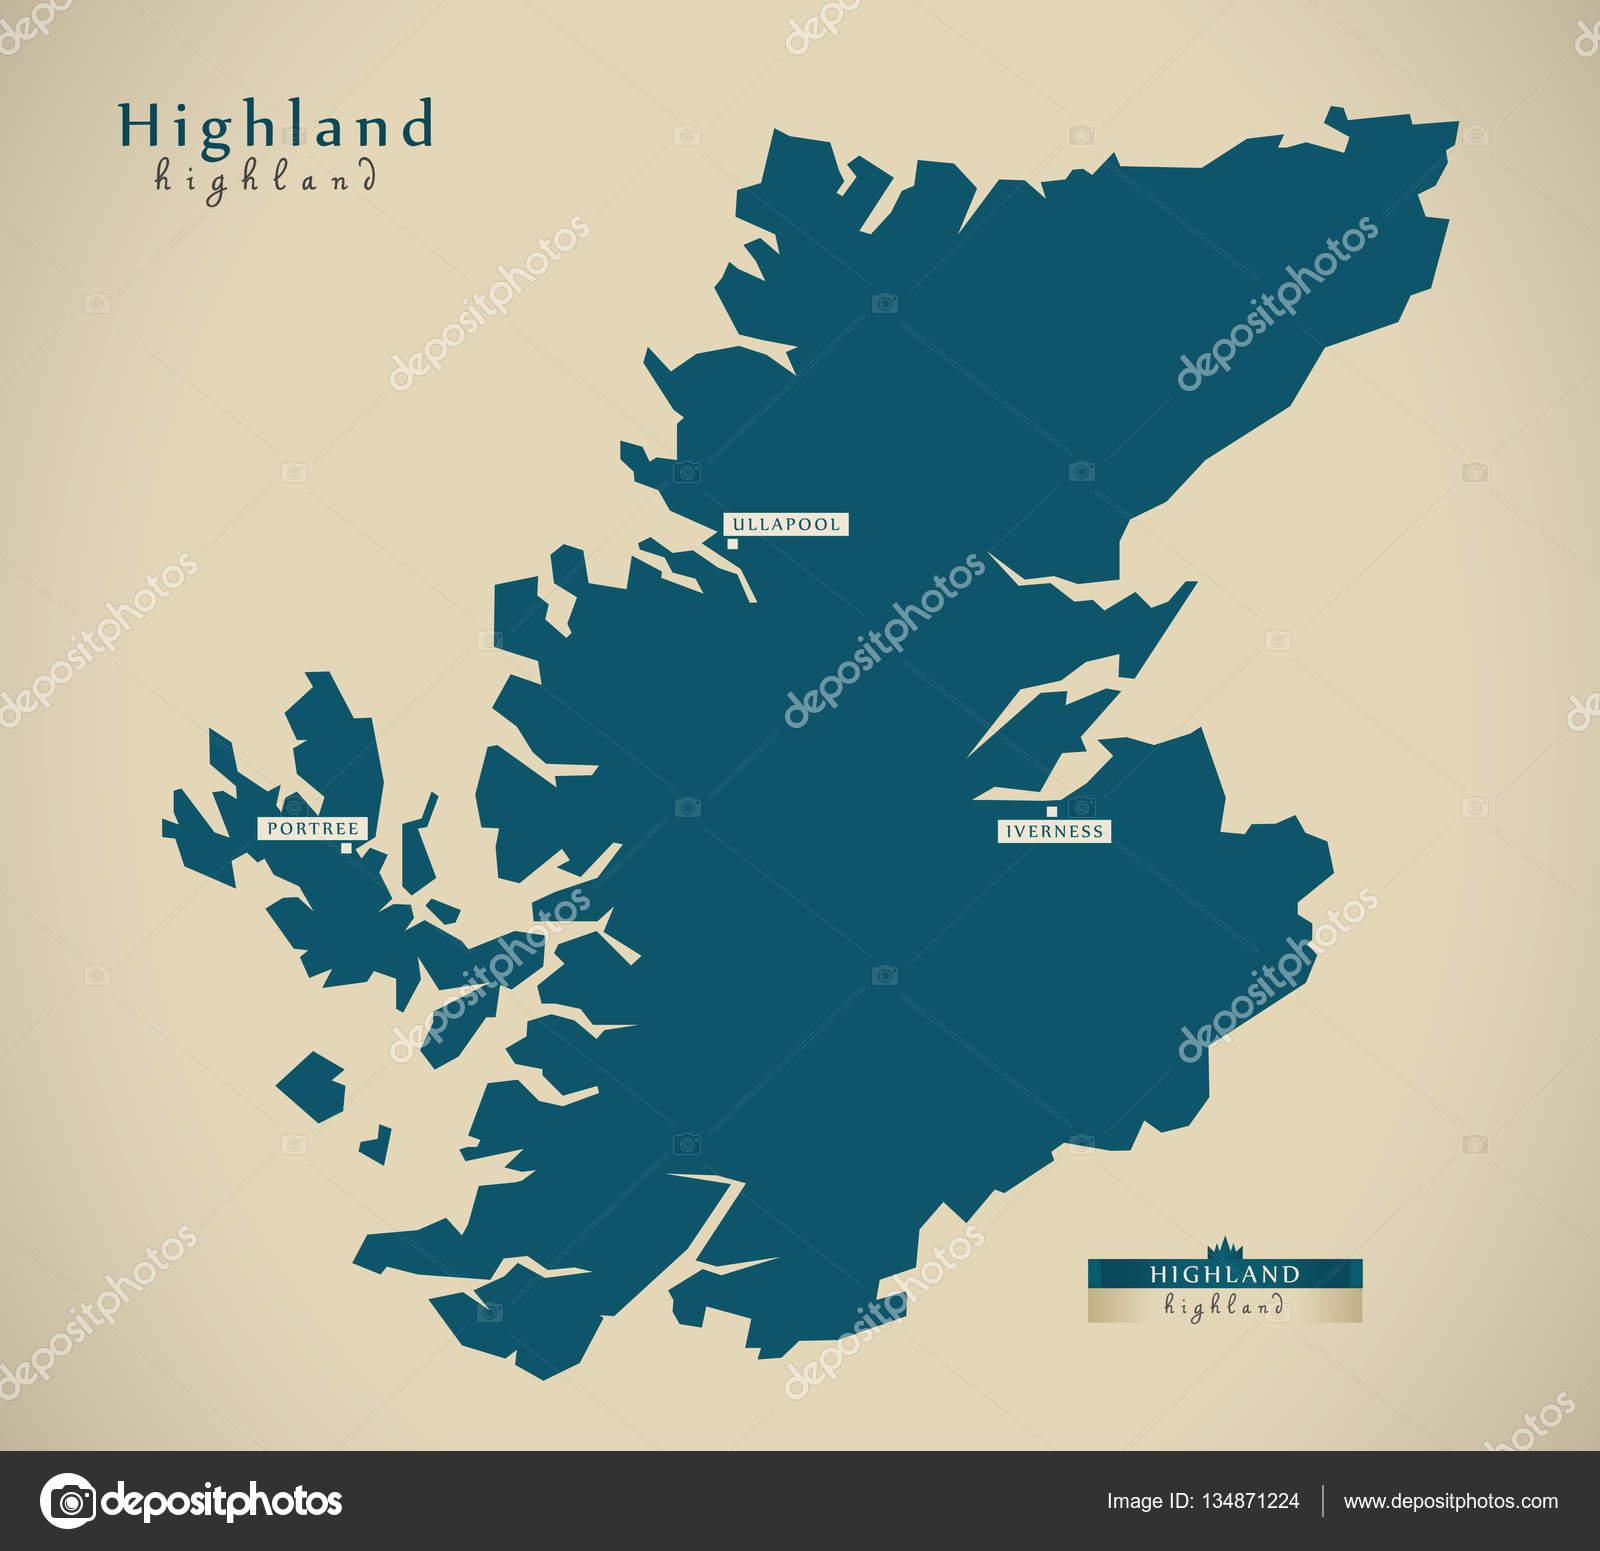 Schottland Karte Highlands.Moderne Karte Highland Uk Schottland Stockfoto Ingomenhard